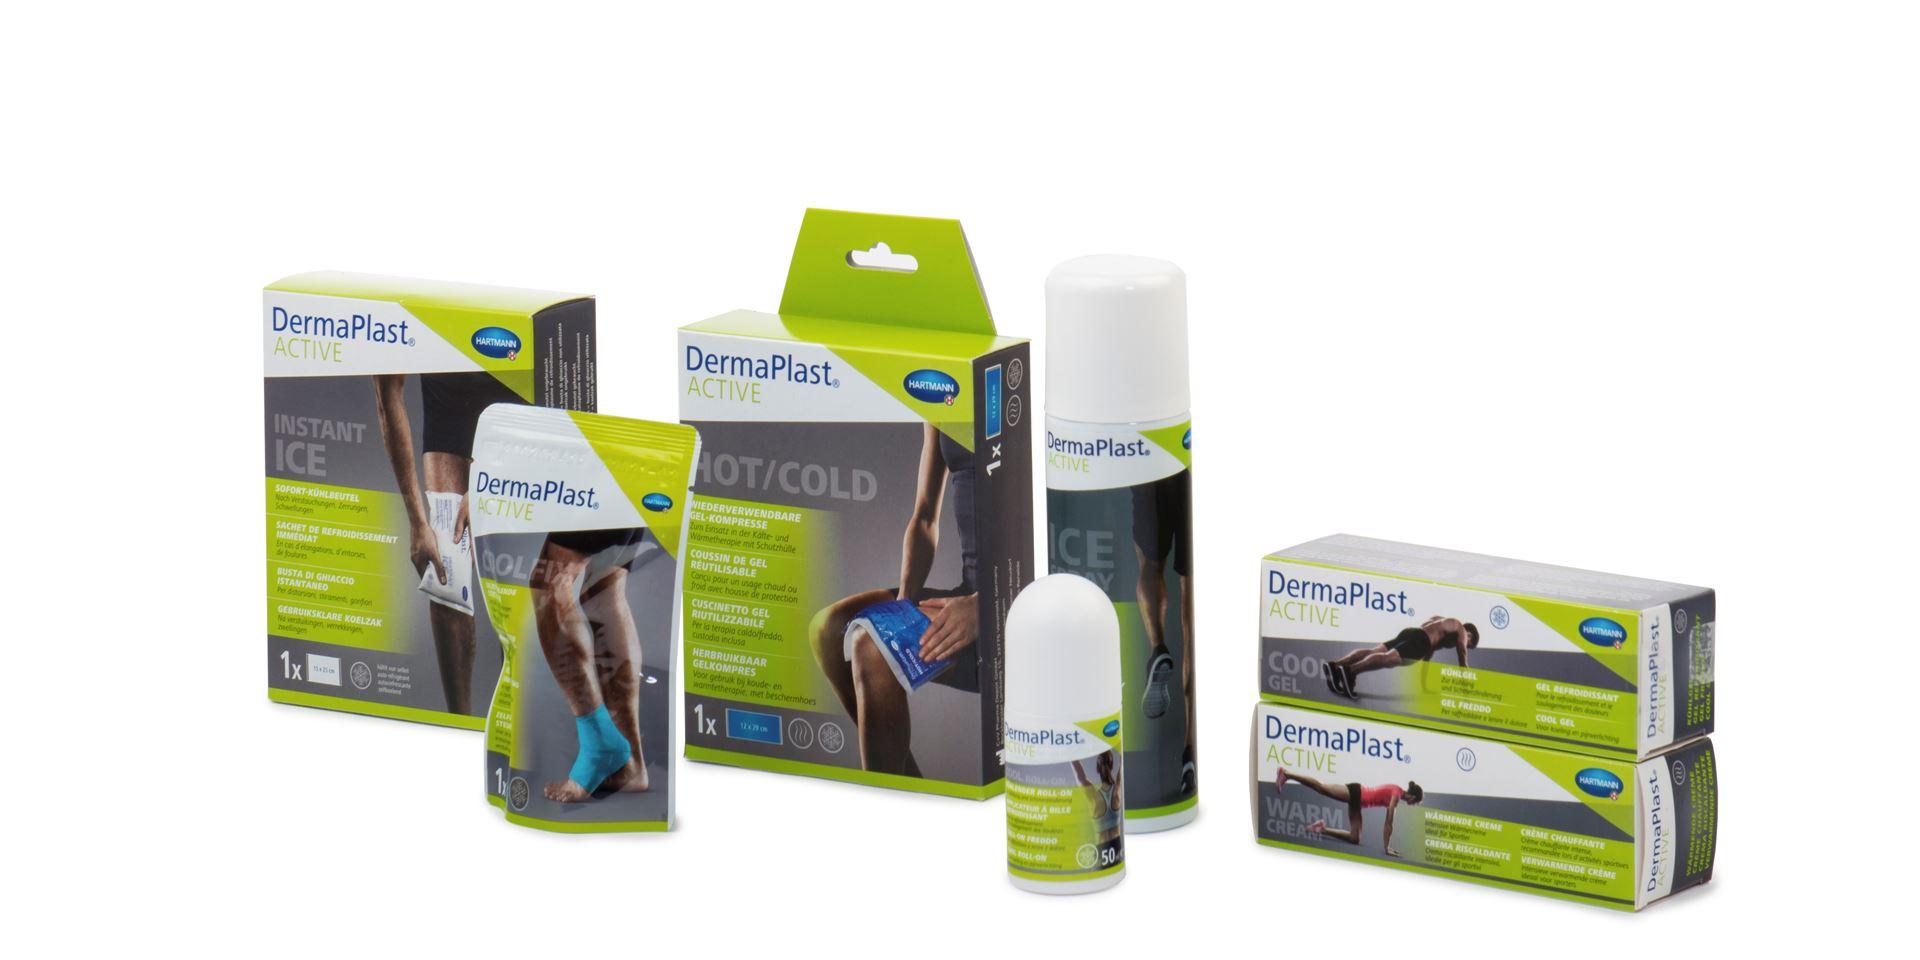 Image de la catégorie Wärmende und kühlende Produkte